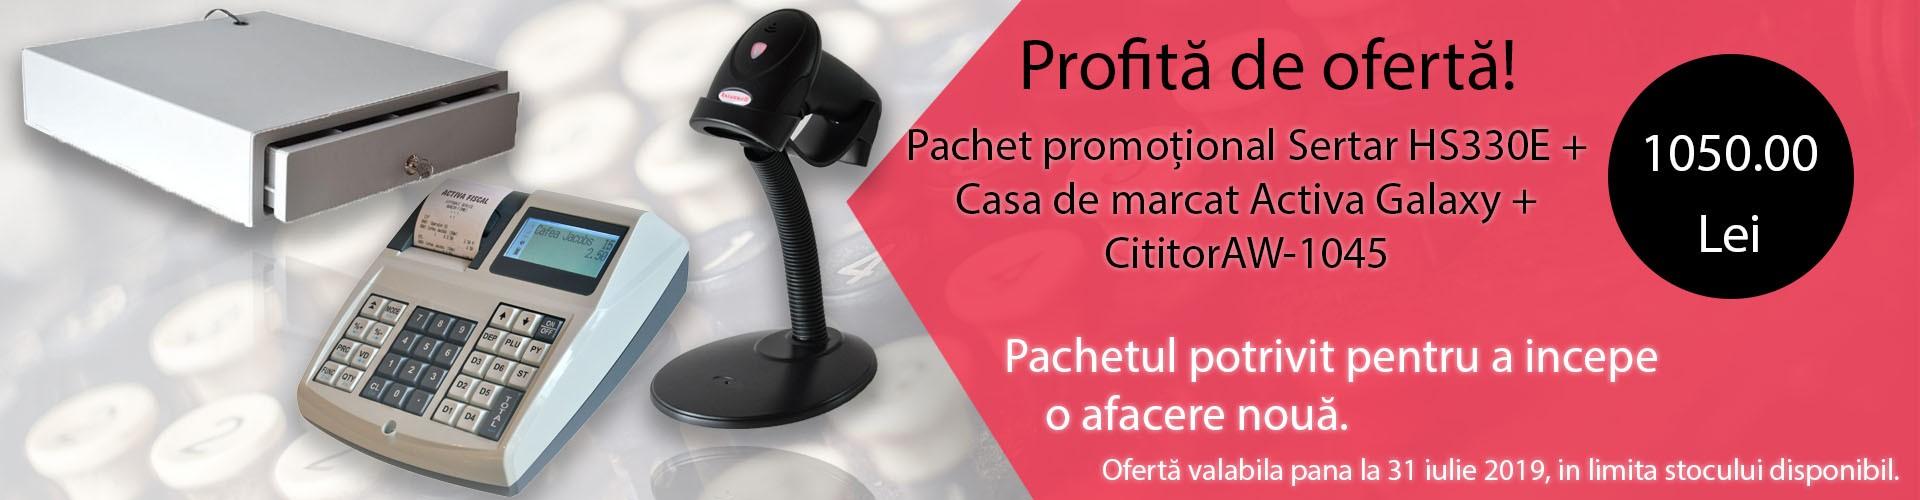 Pachet promotional casa de marcat + sertar de bani + cititor coduri de bare